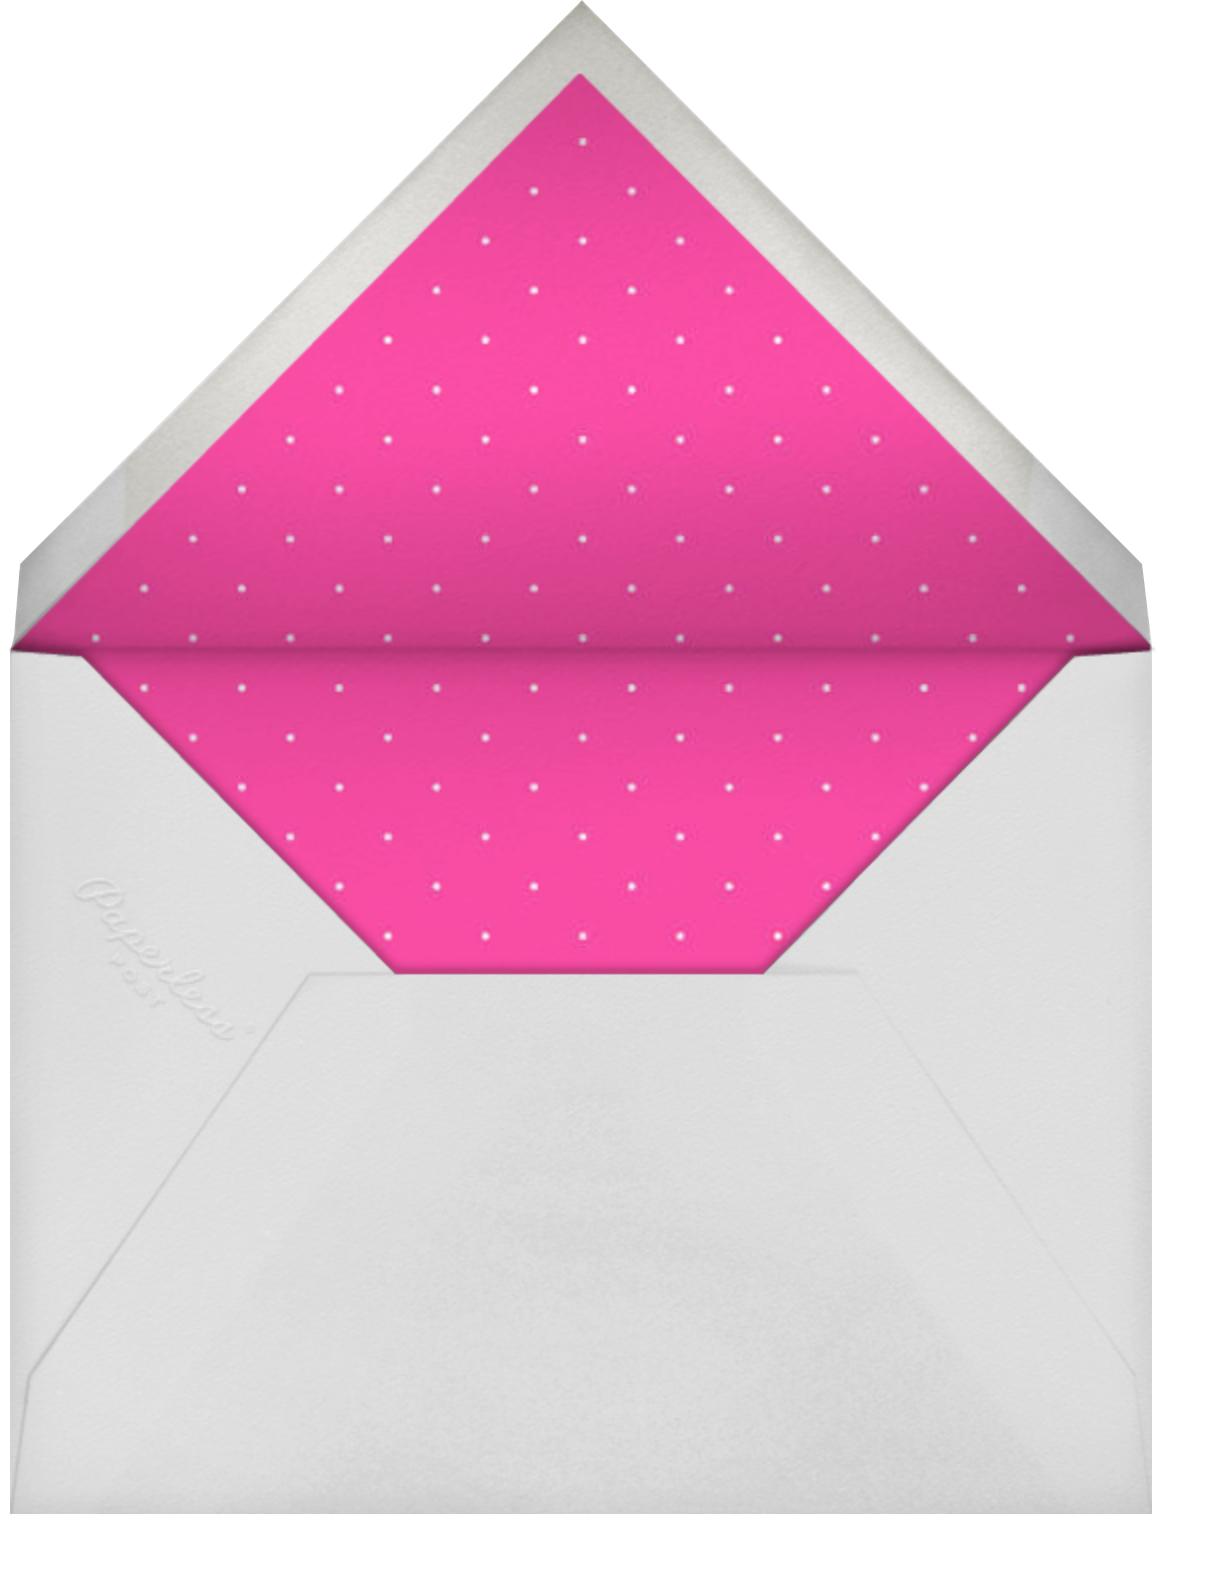 Brixton Brief Case - Pink - Paperless Post - Bachelorette party - envelope back